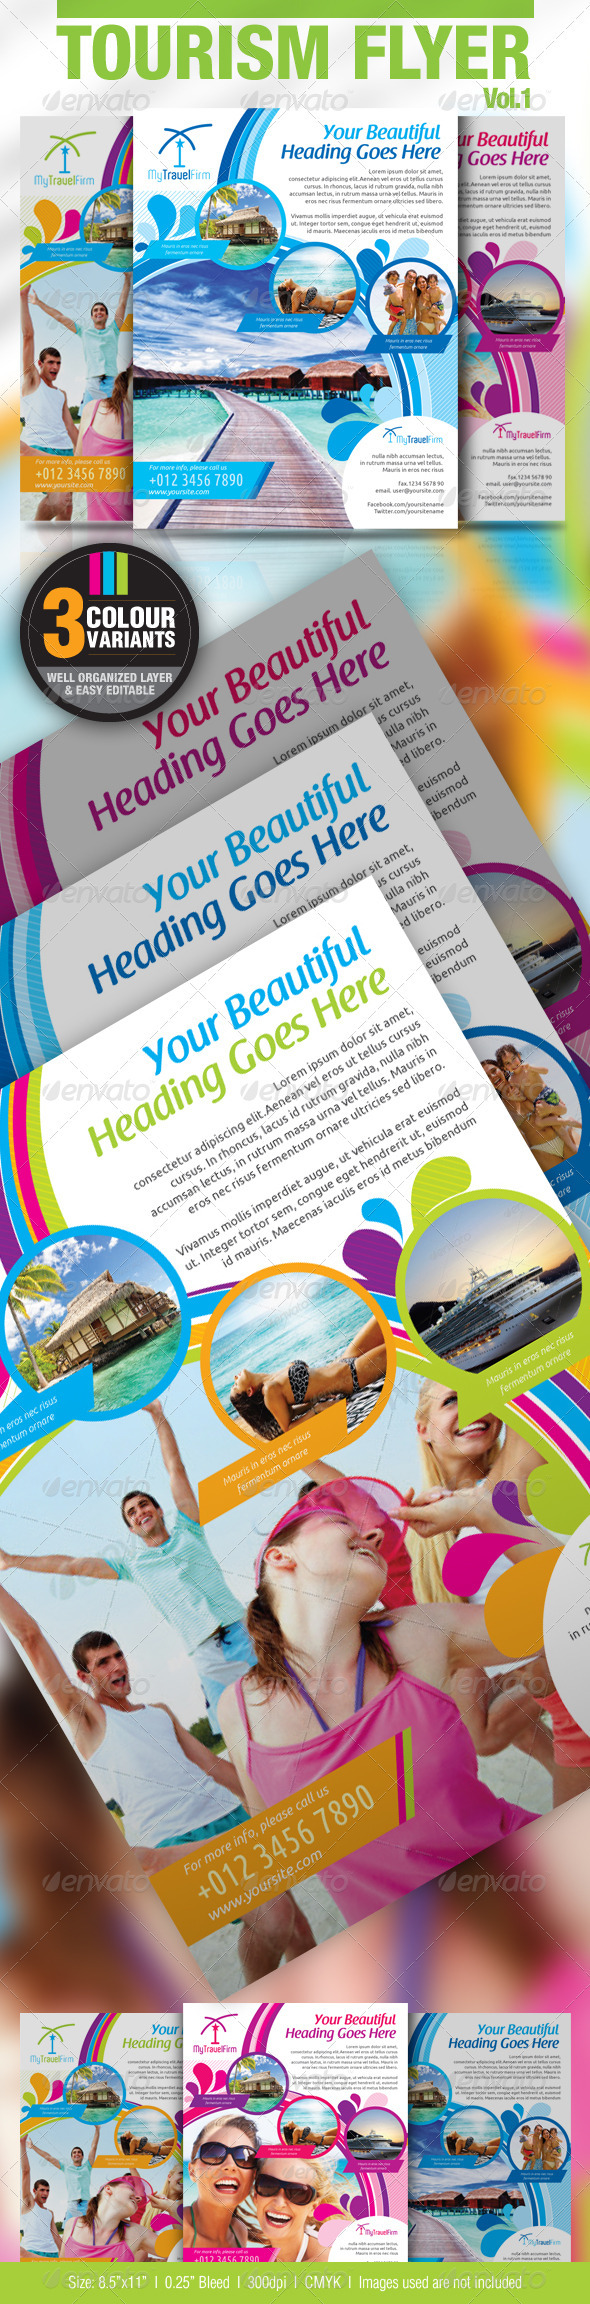 GraphicRiver Tourism Flyer Vol.1 2641492